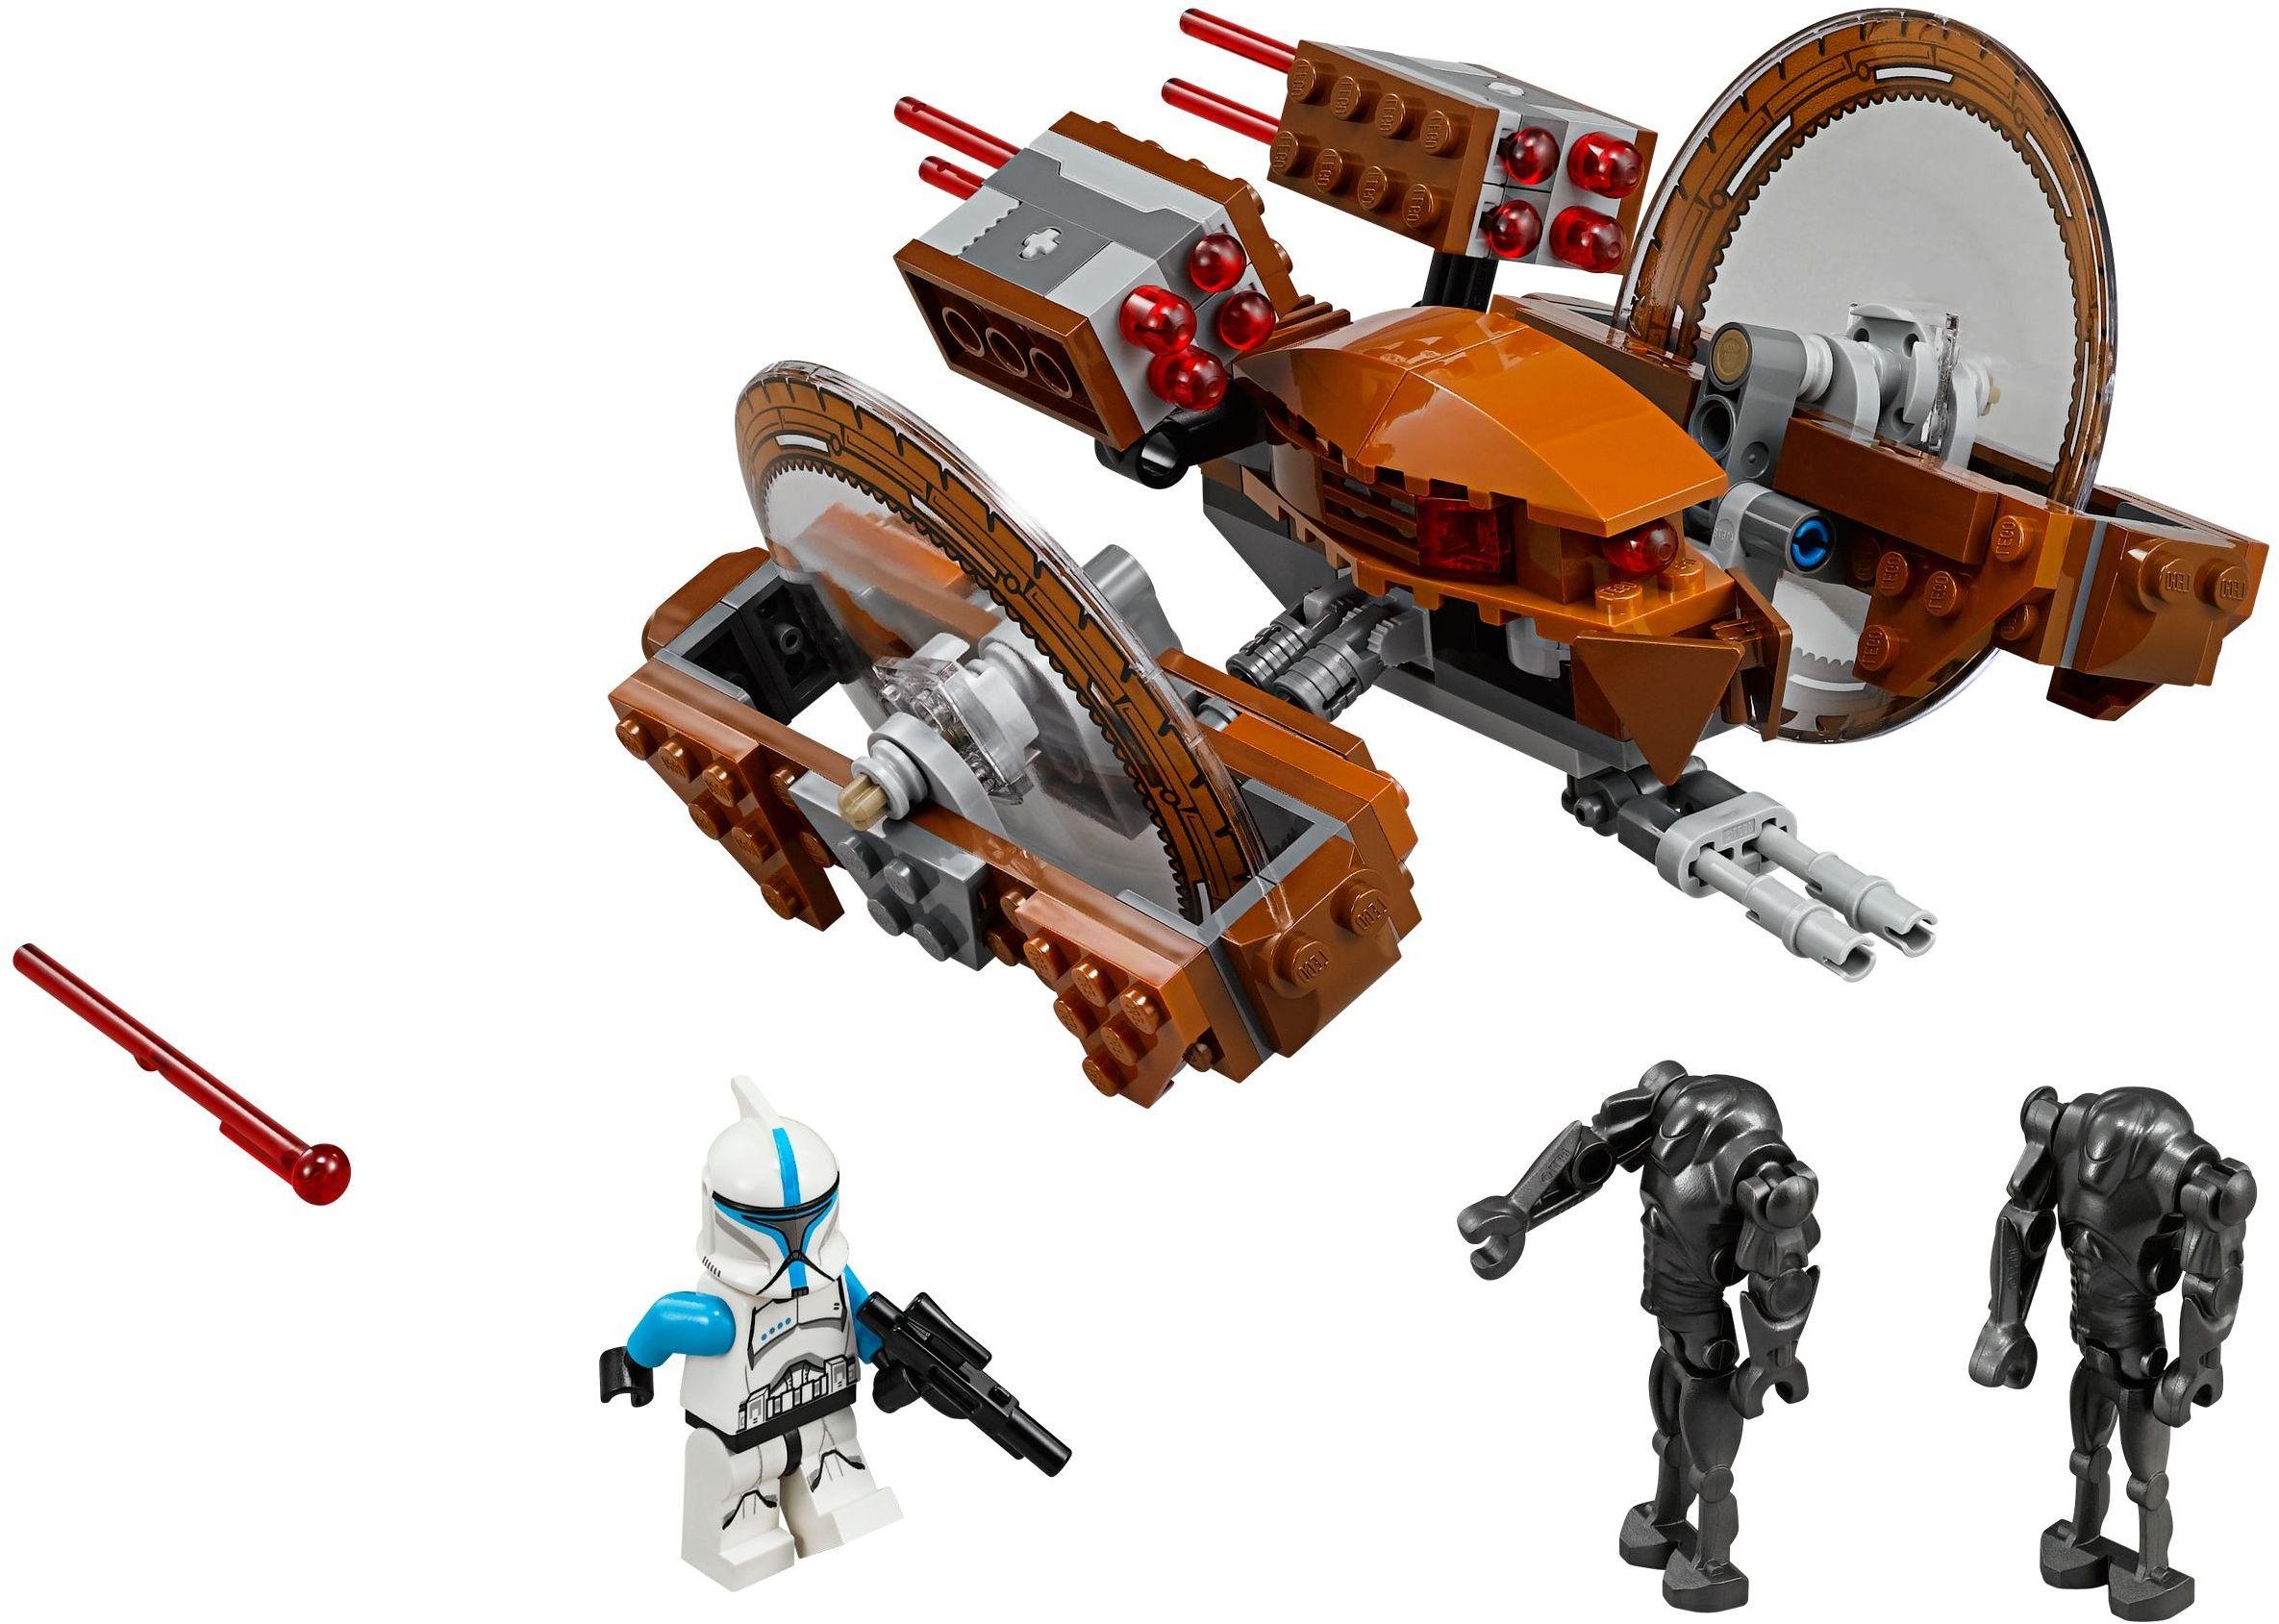 lego star wars 2015 hailfire droid review